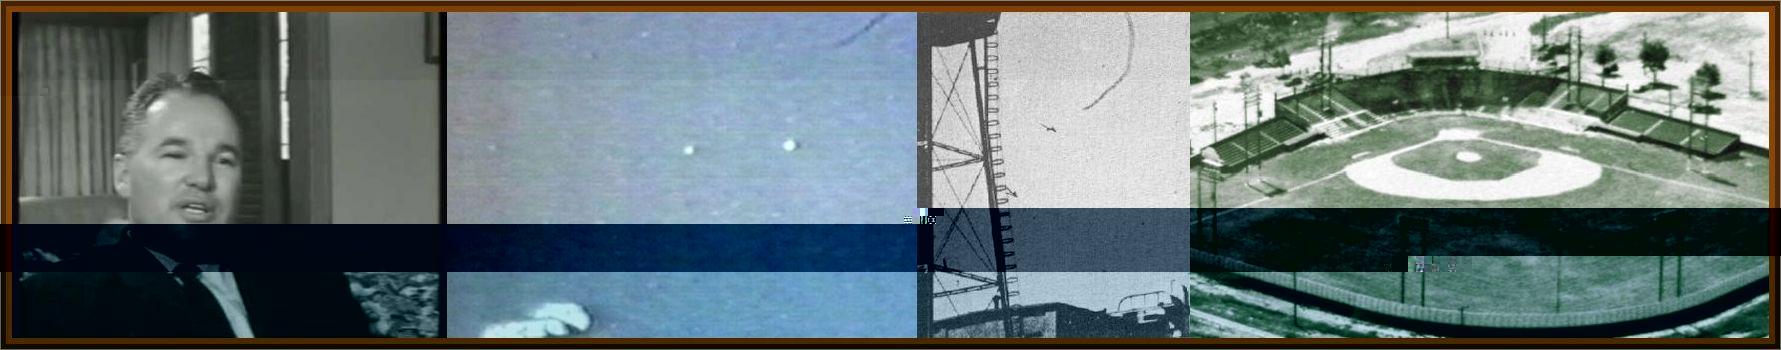 Mariana UFO Incident